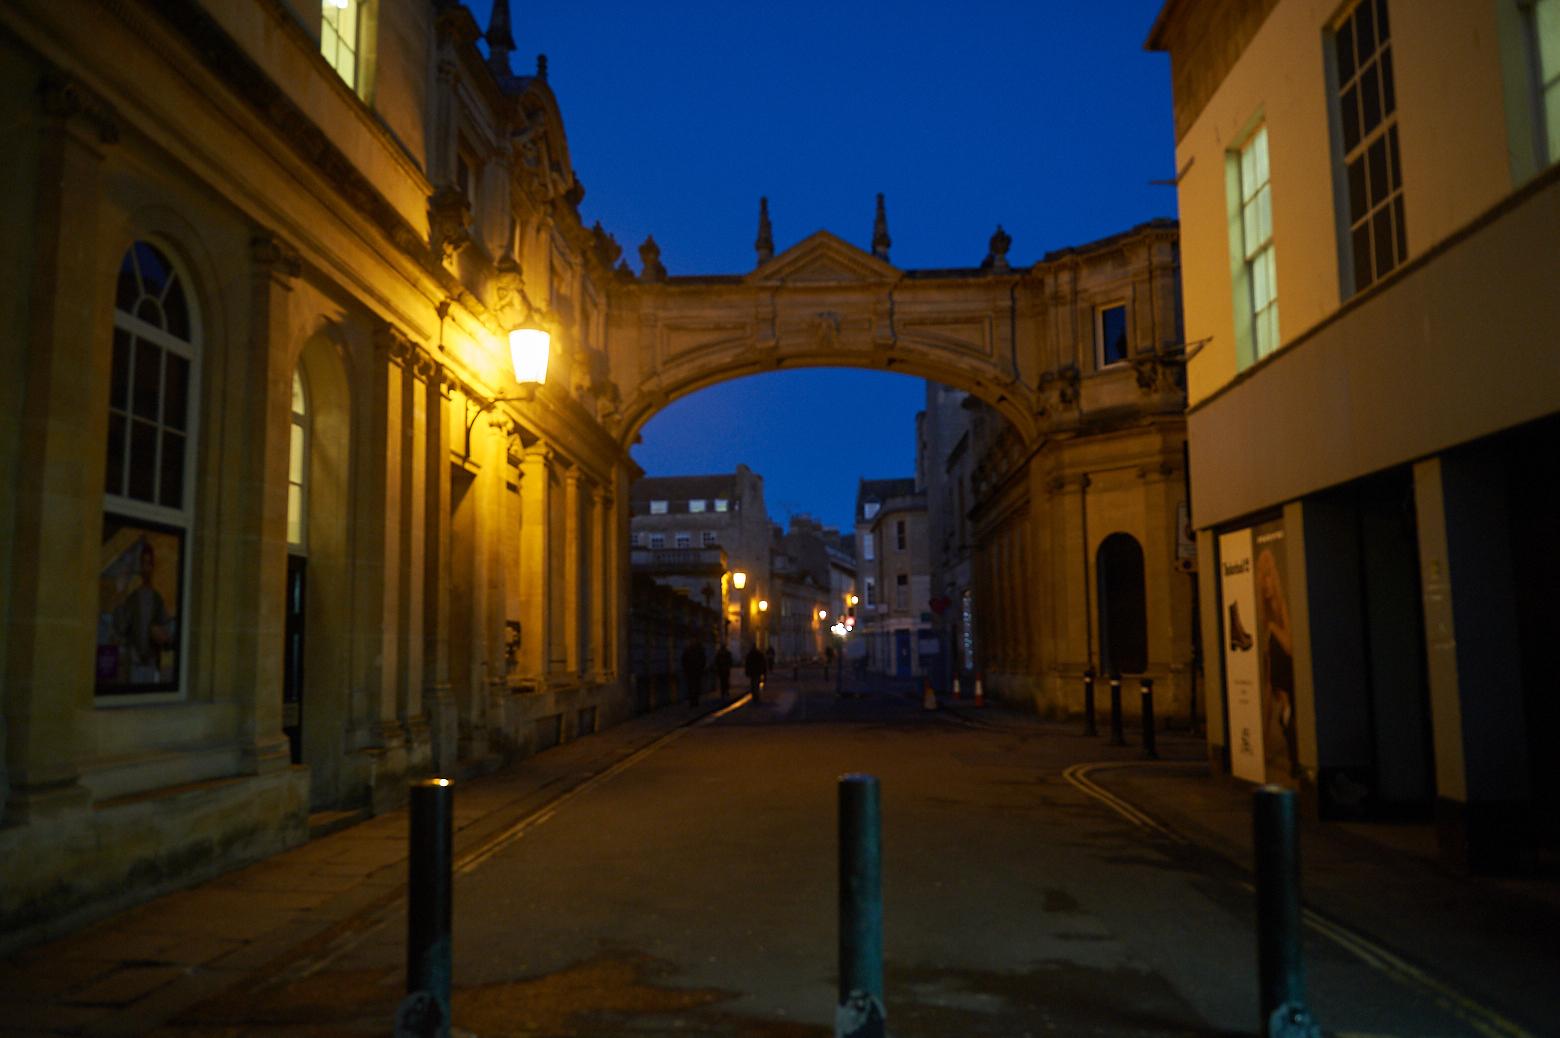 bath, somerset, england, jane austen, town, uk, photos and the city, ursula travels, sunset, roman bath